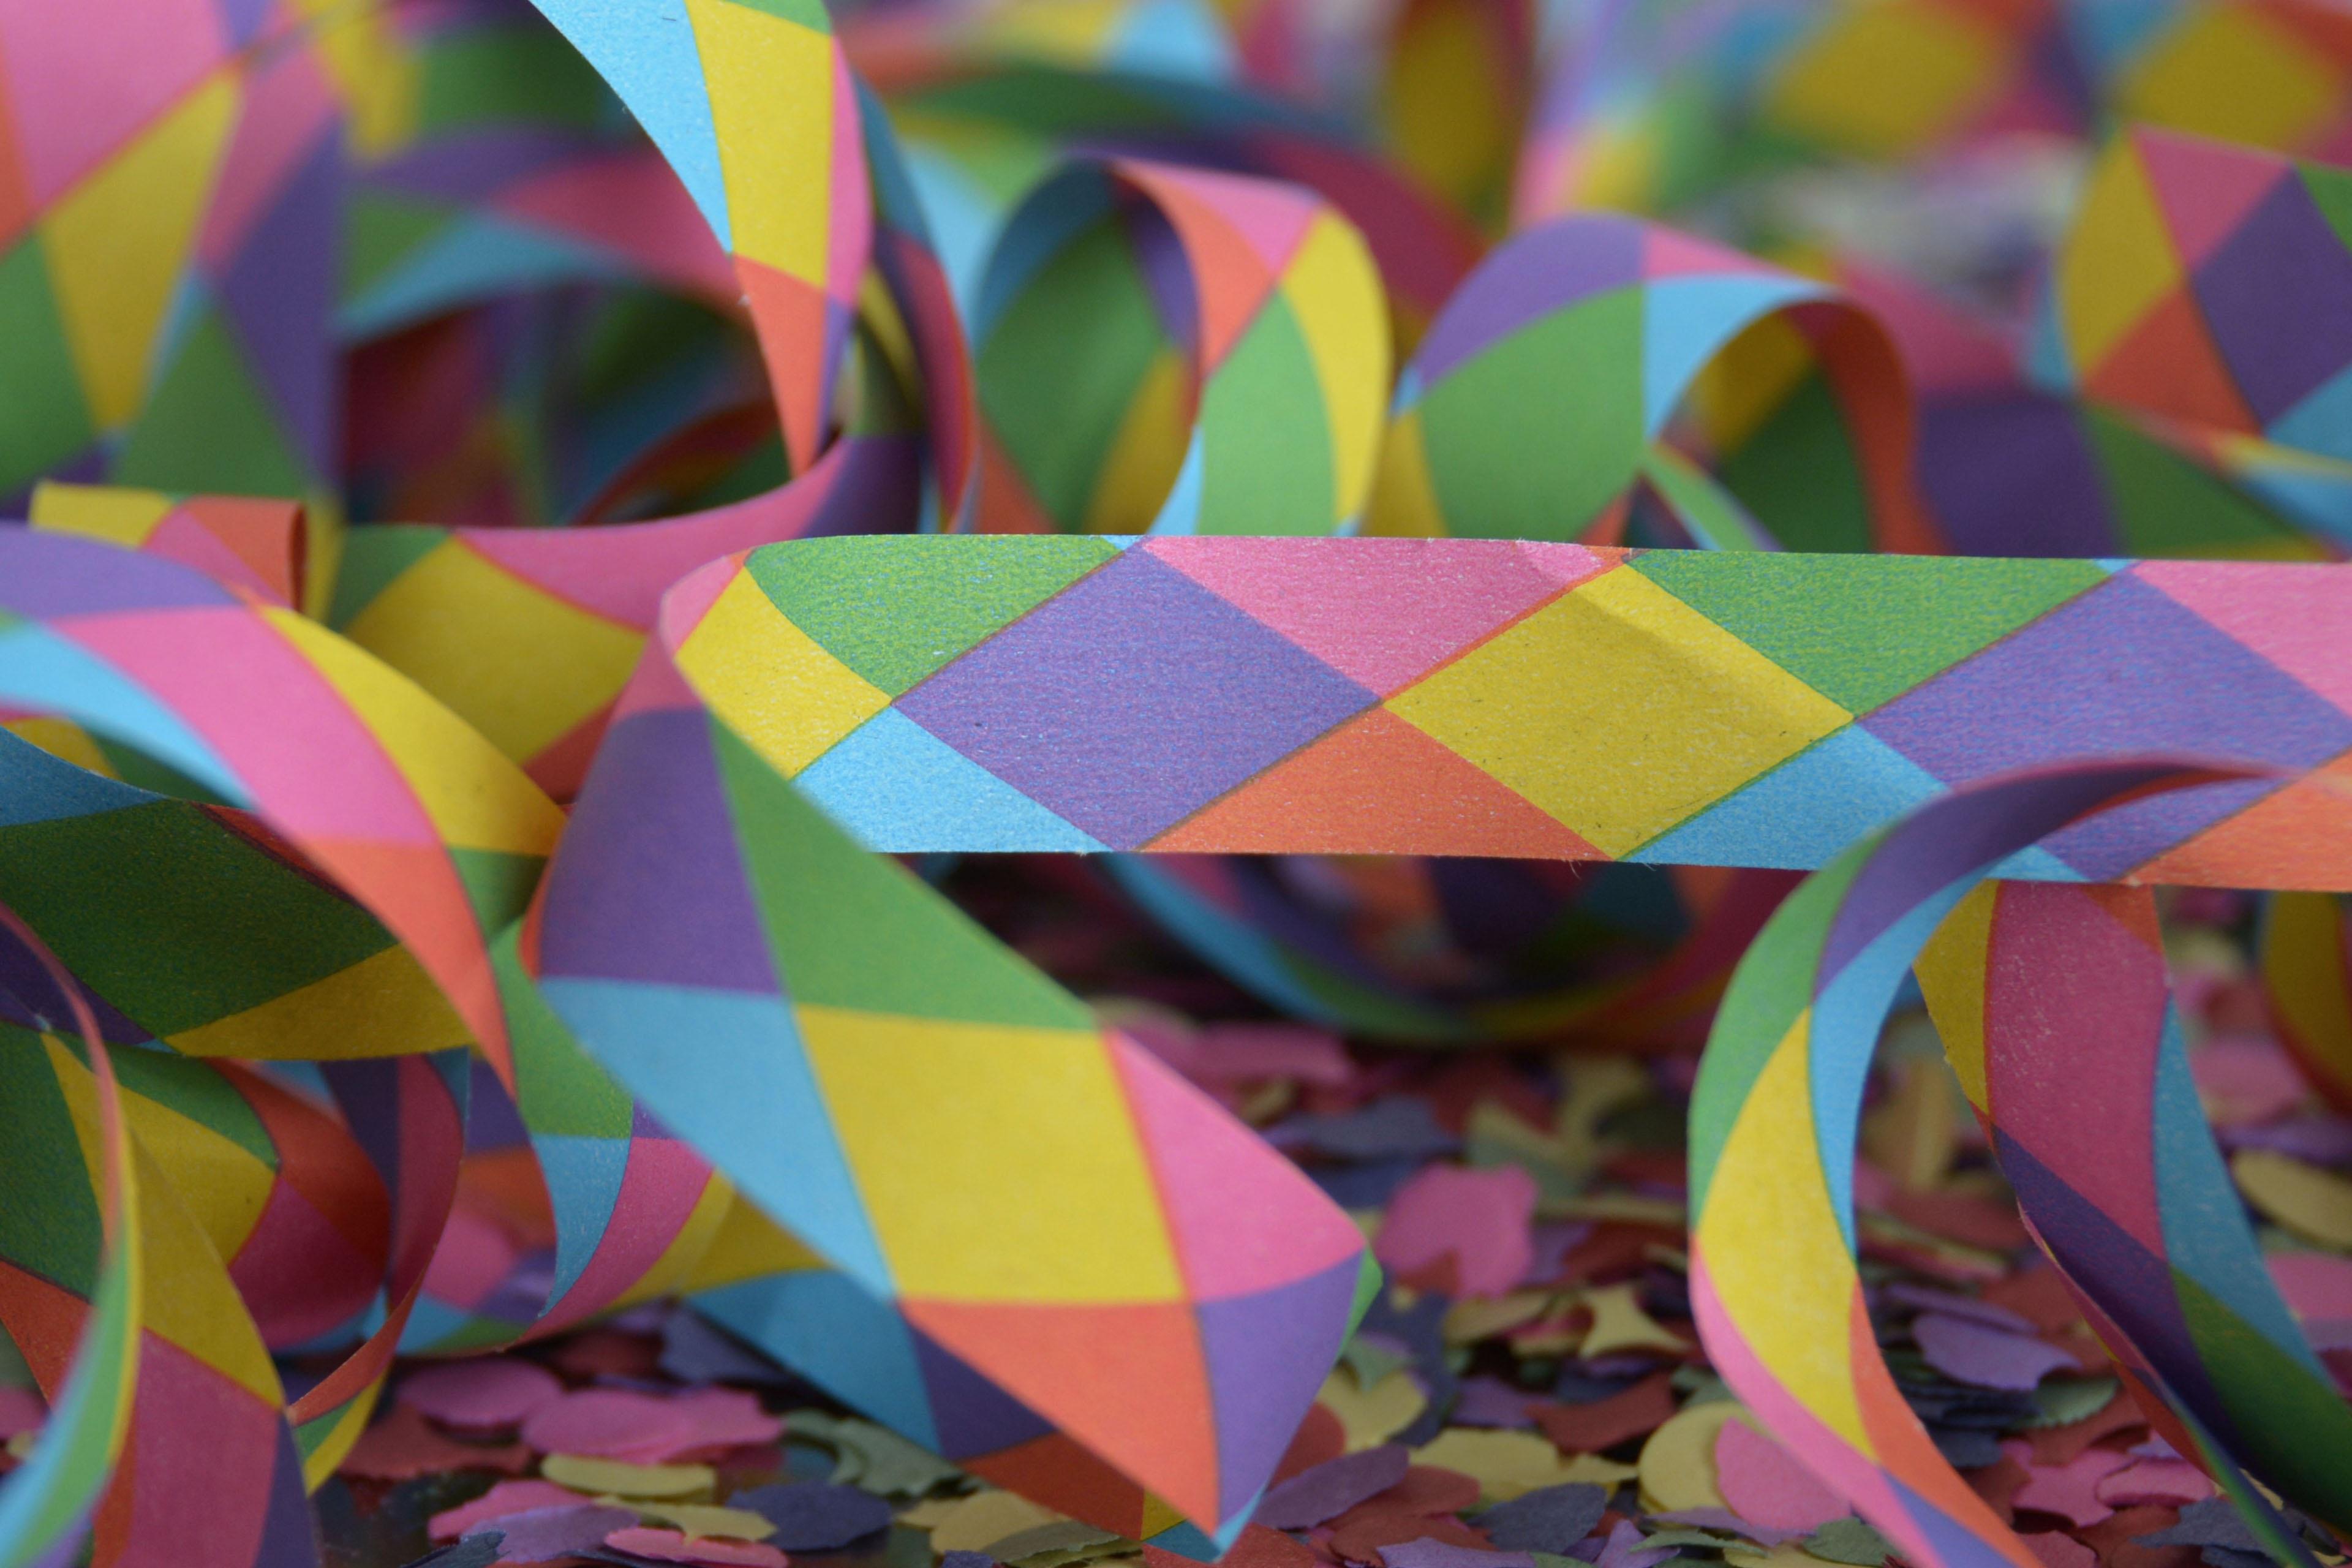 free images wheel flower petal celebration pattern carnival